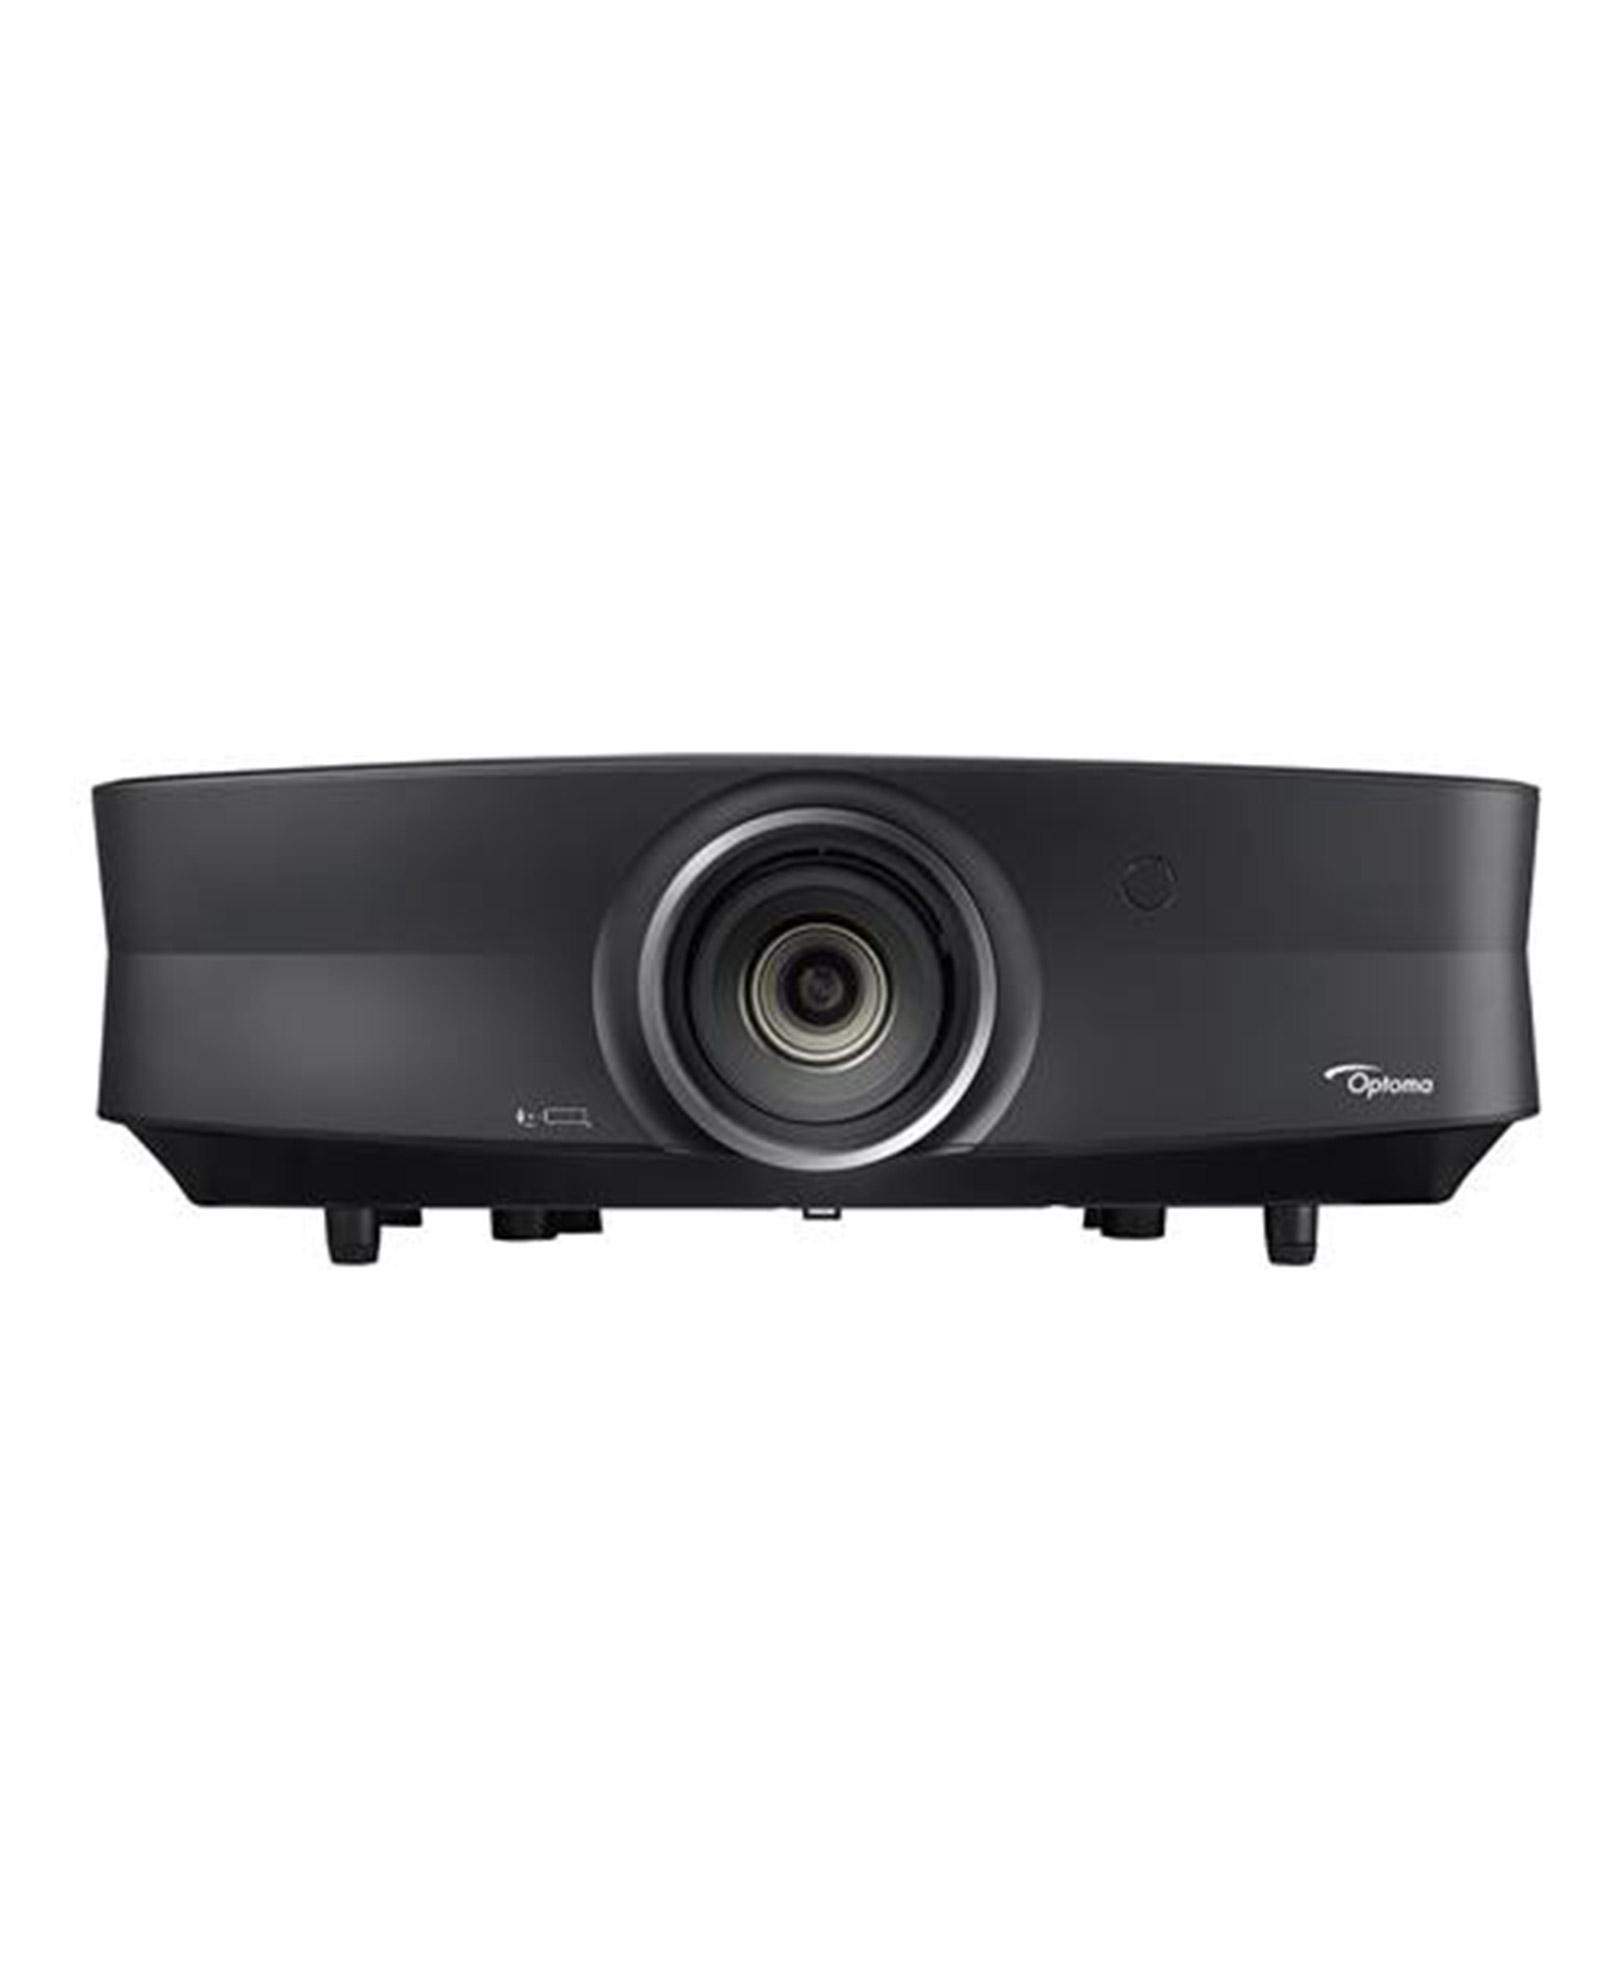 Optoma Uhz65 4k Uhd Home Cinema Laser Projector